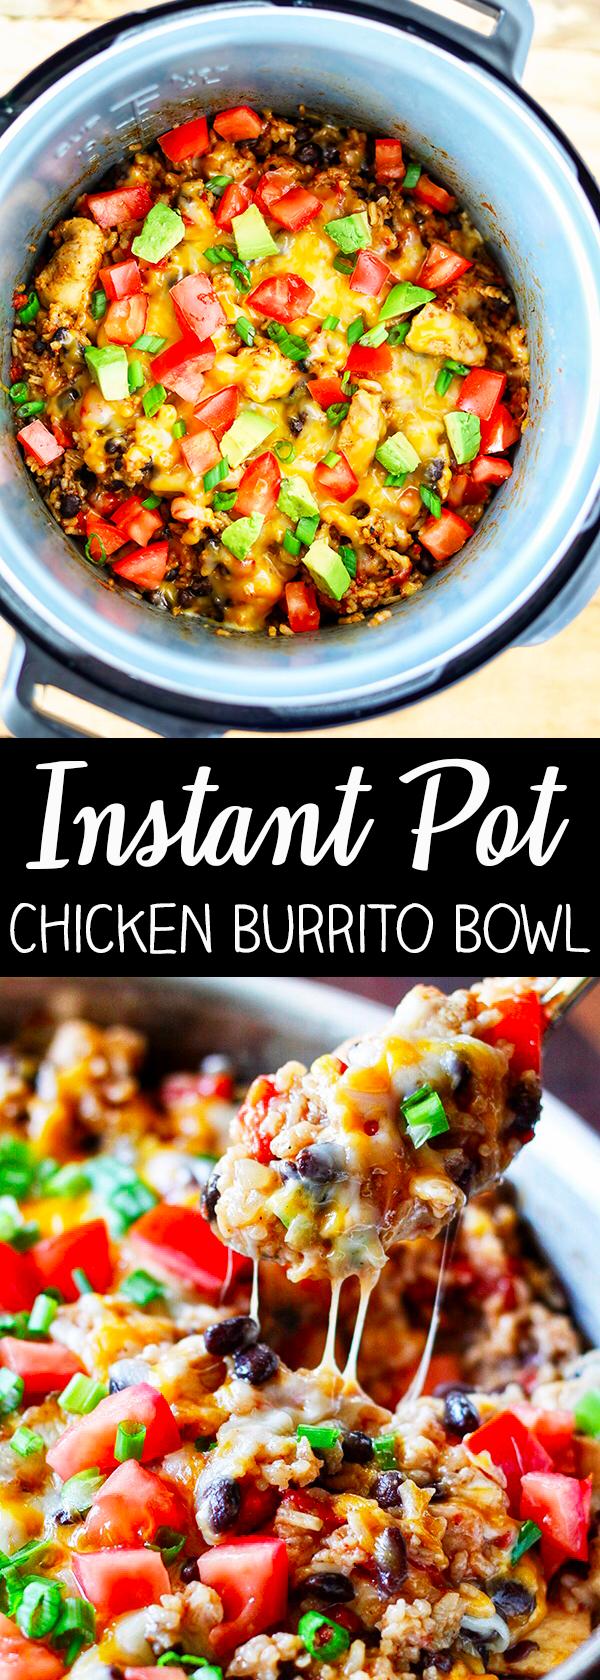 Instant Pot Chicken Burrito Bowl -   19 healthy instant pot recipes chicken burrito bowl ideas